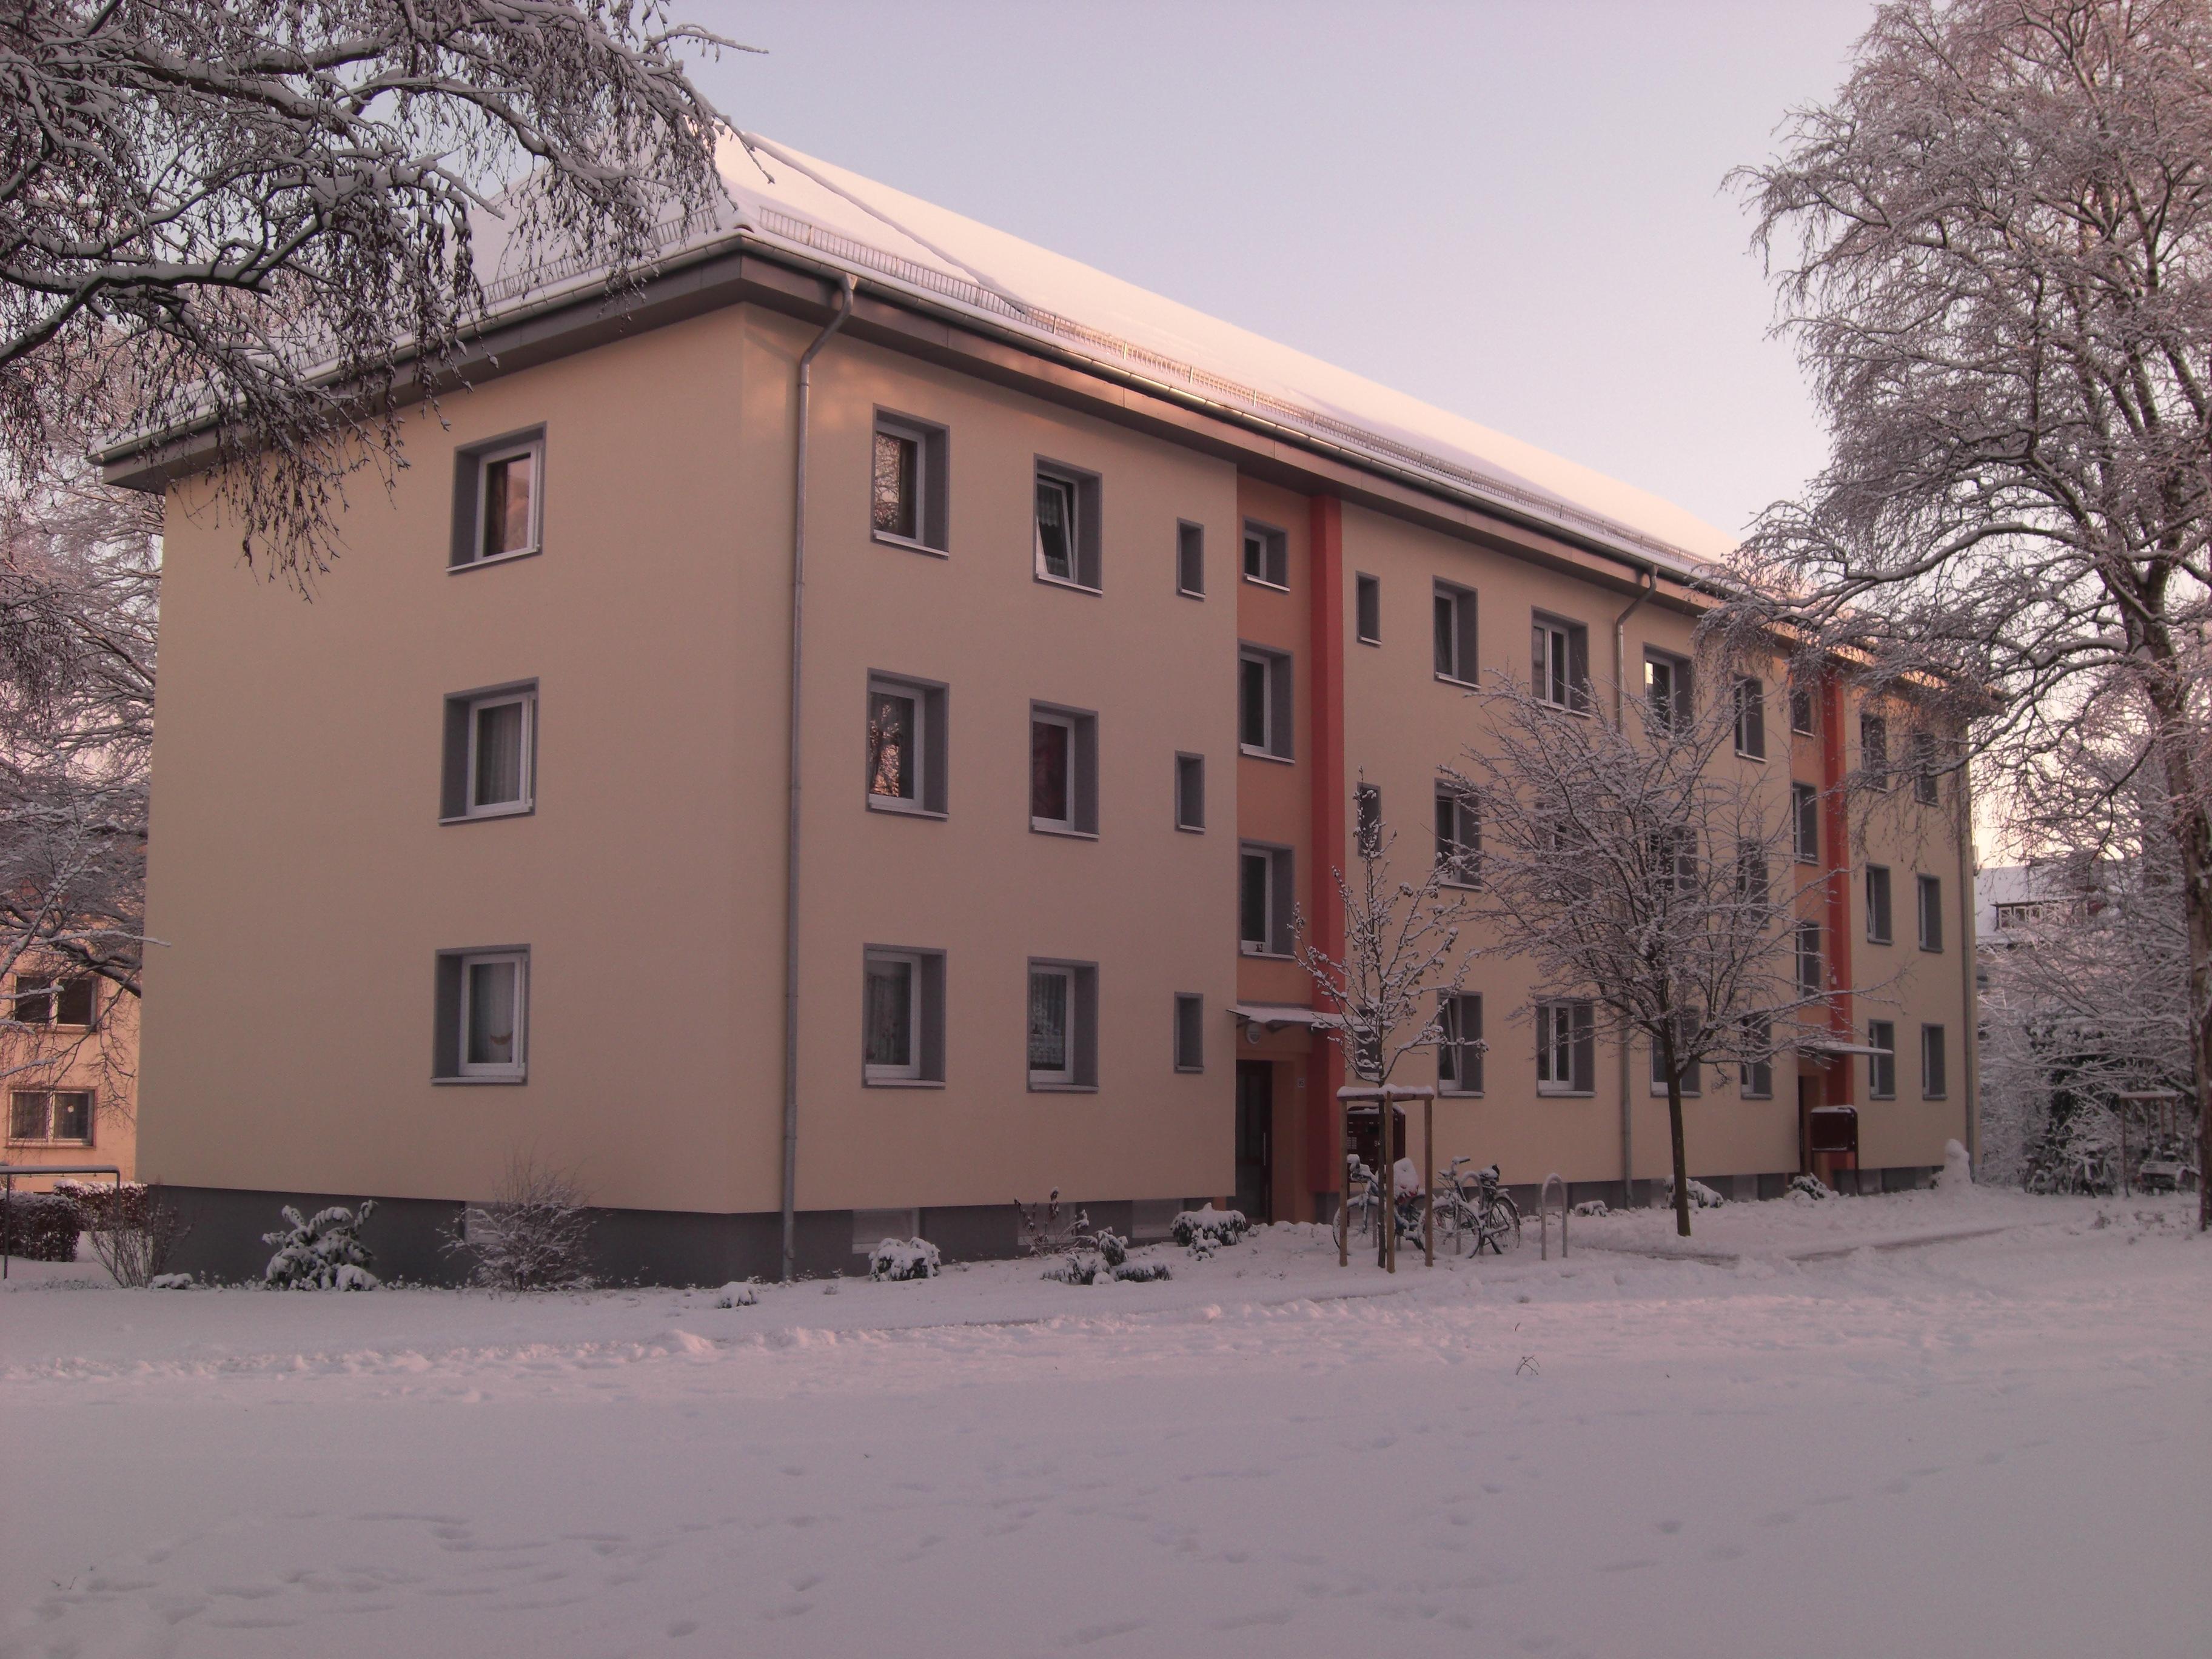 klitzneburg-93-95.JPG